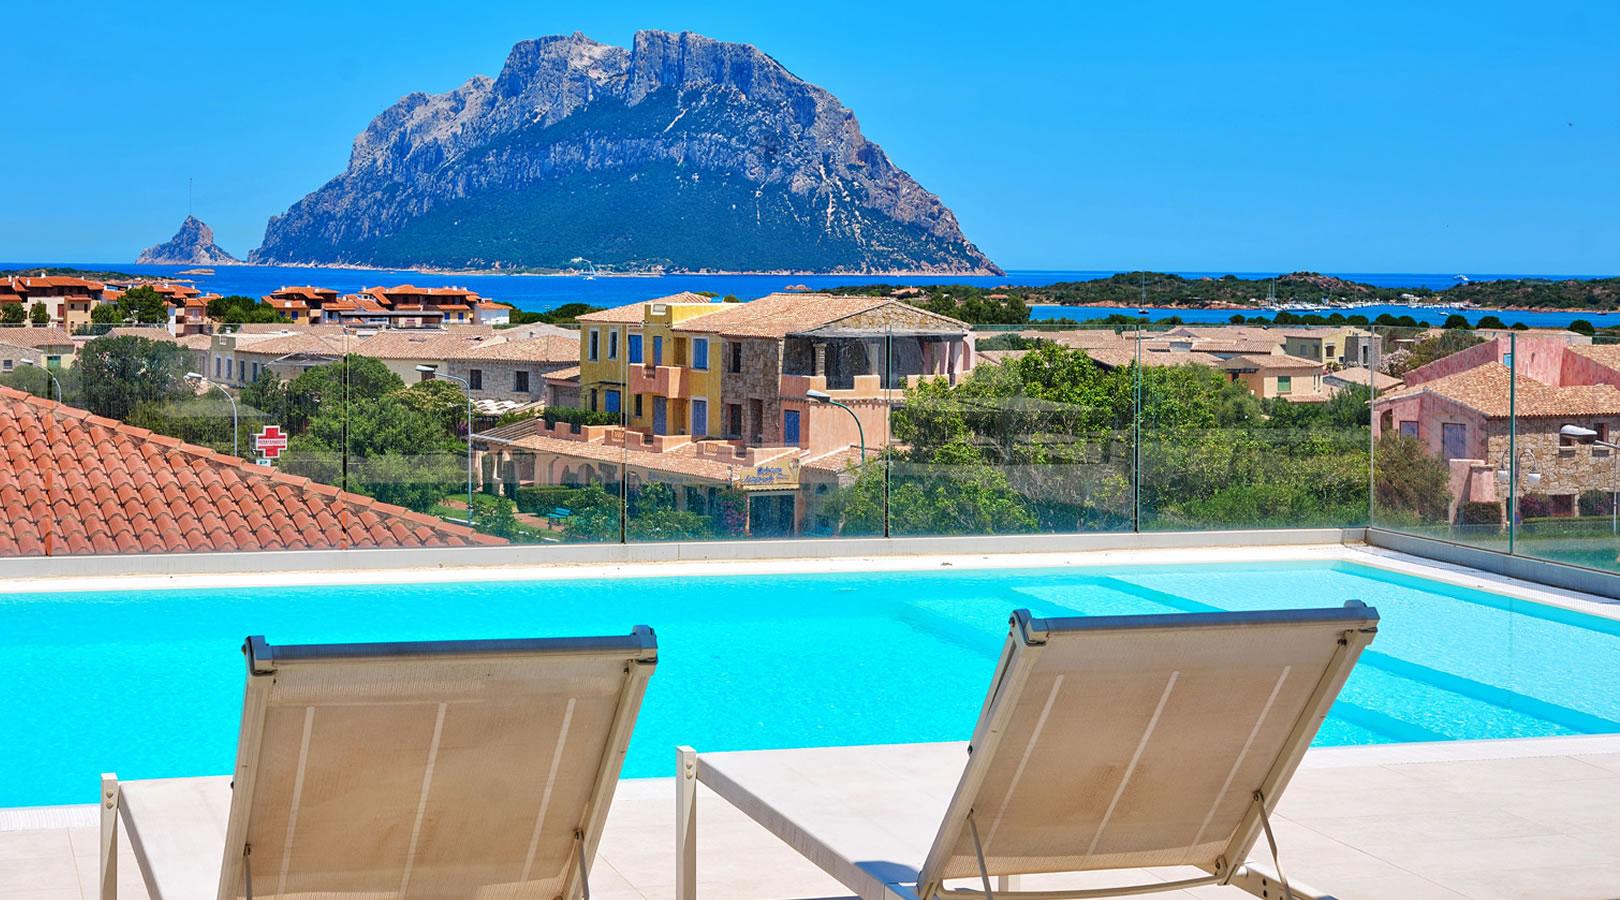 gruppo-felix-hotels-residence-porto-san-paolo-sardegna13